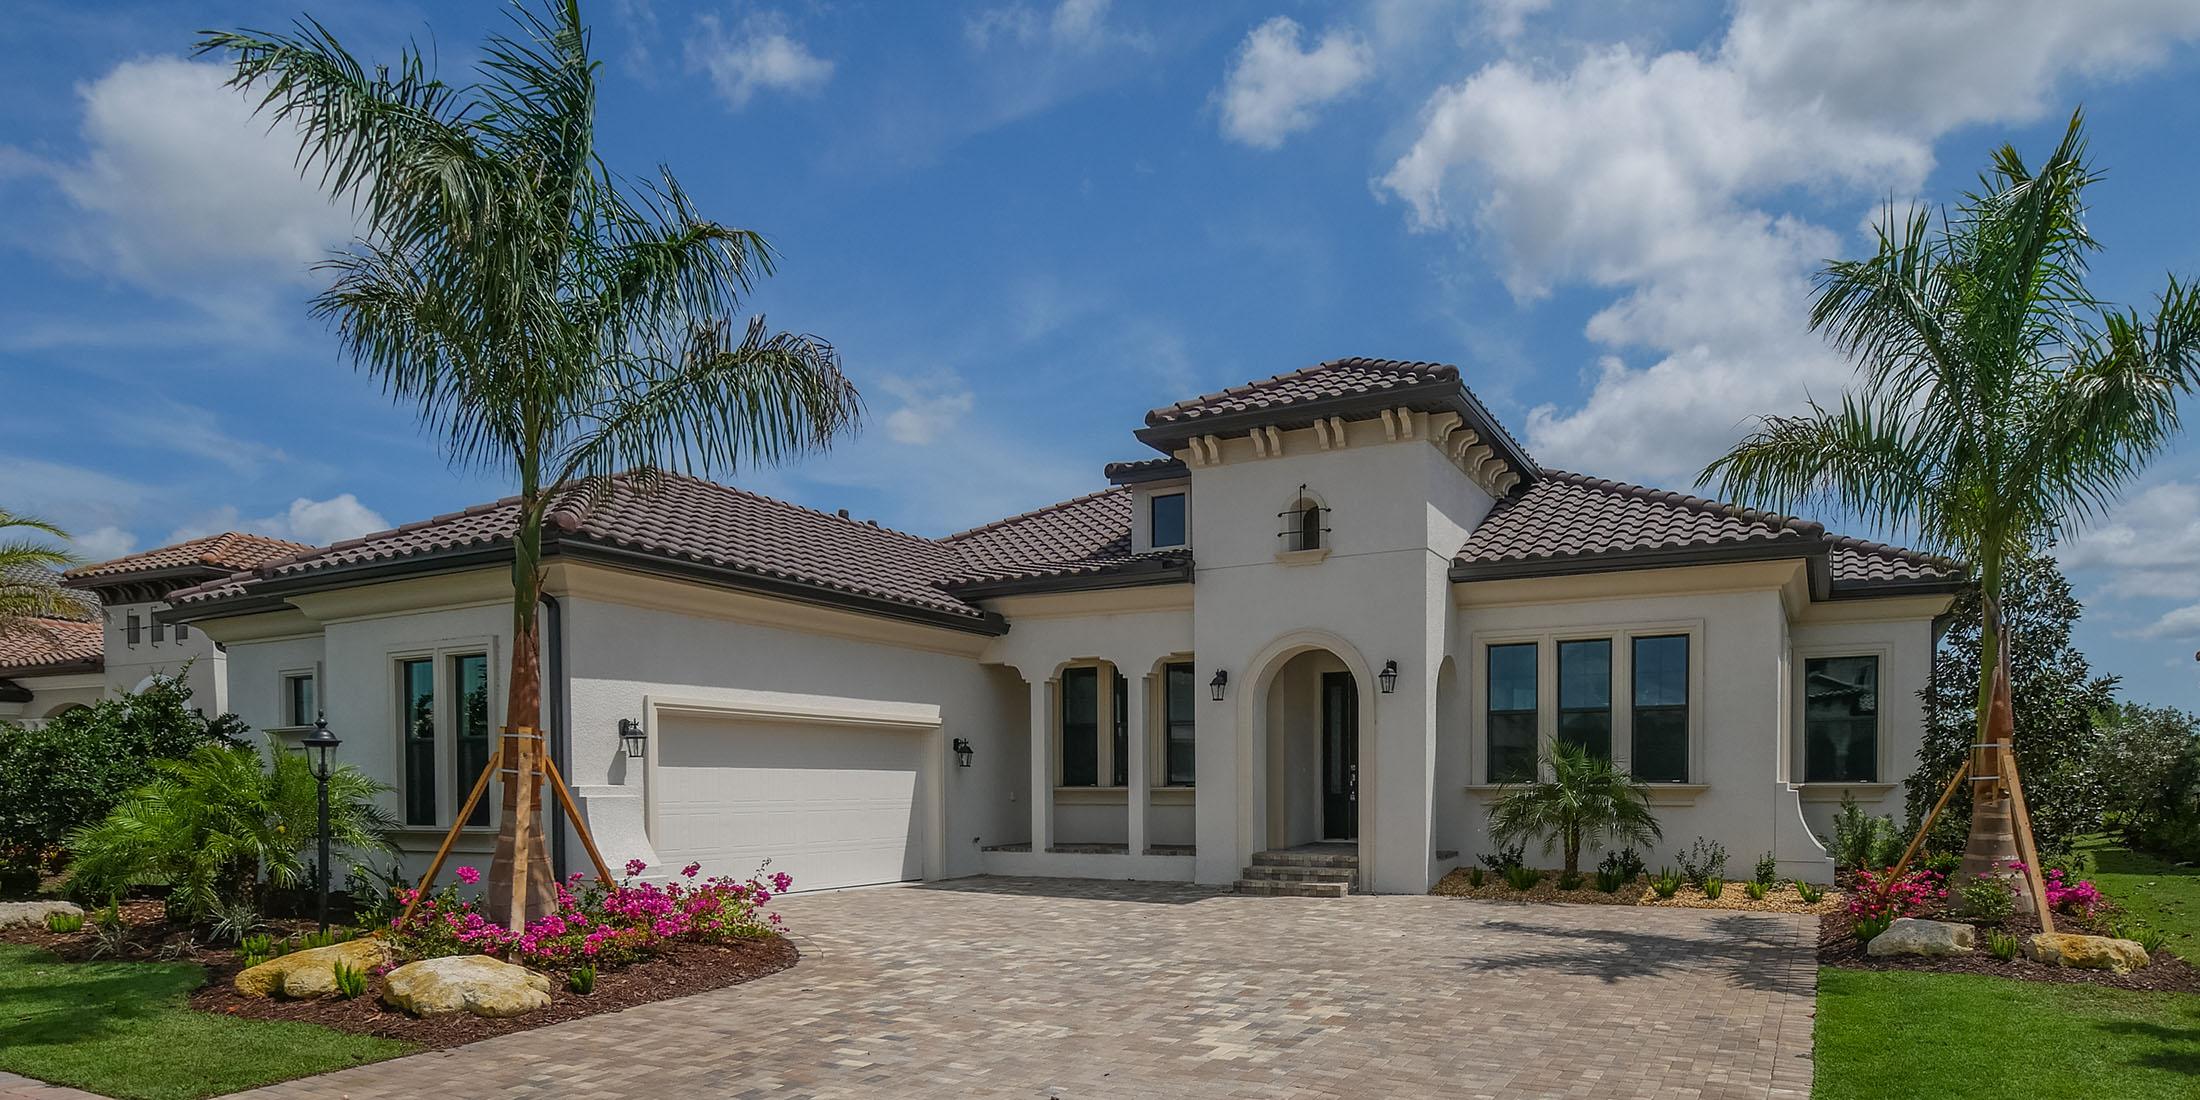 New Homes For Sale West Bradenton Fl